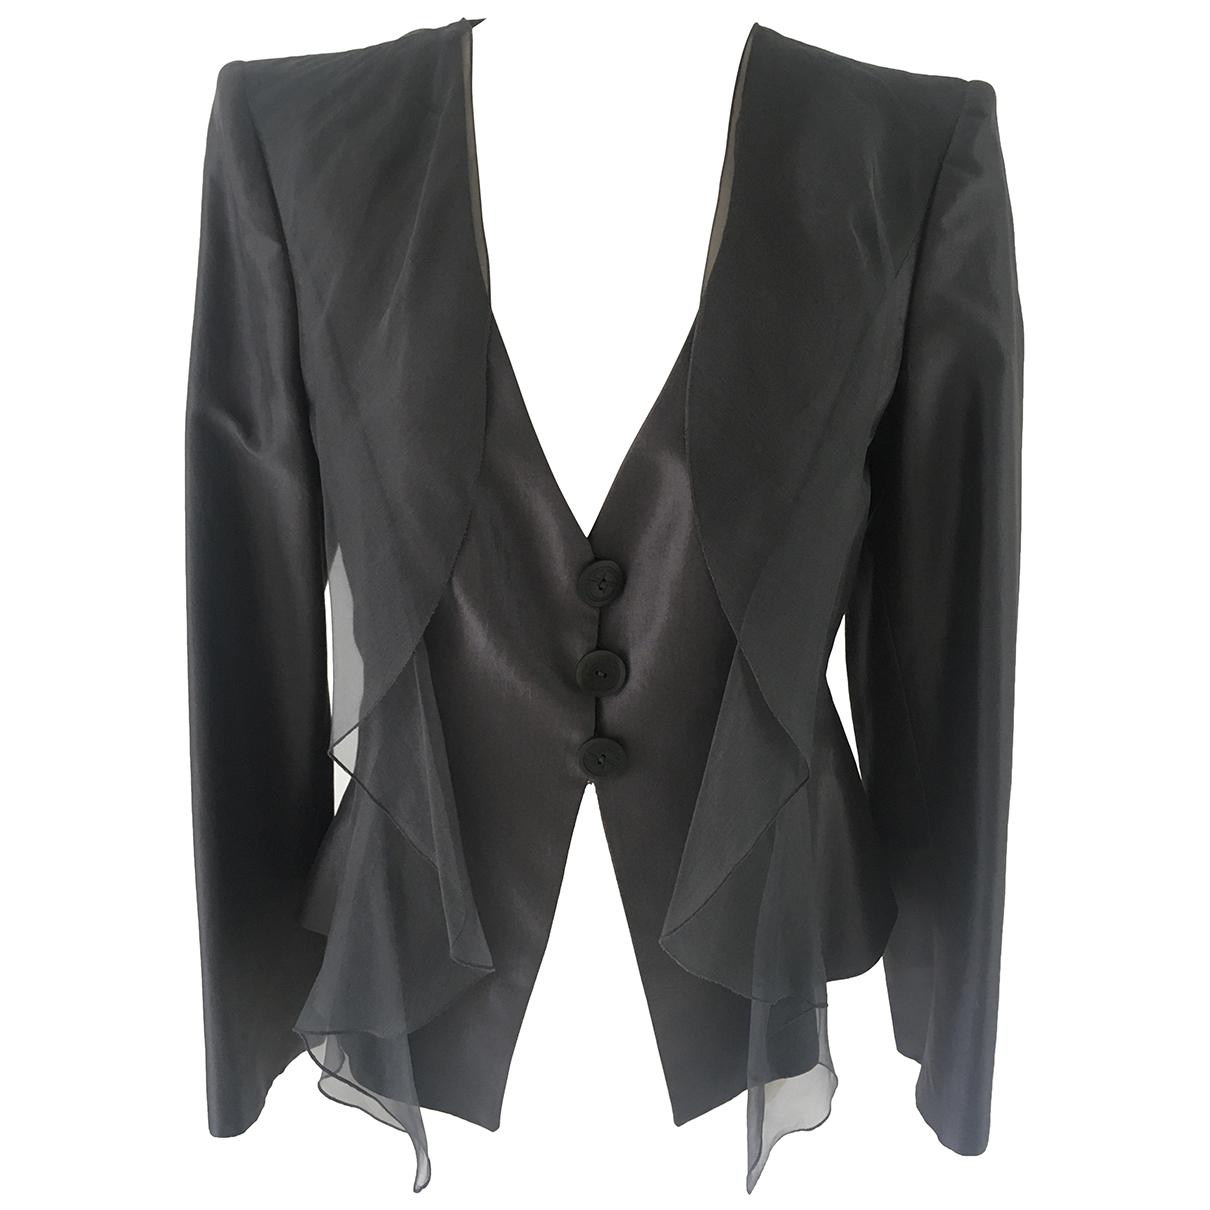 Giorgio Armani - Veste   pour femme en soie - anthracite